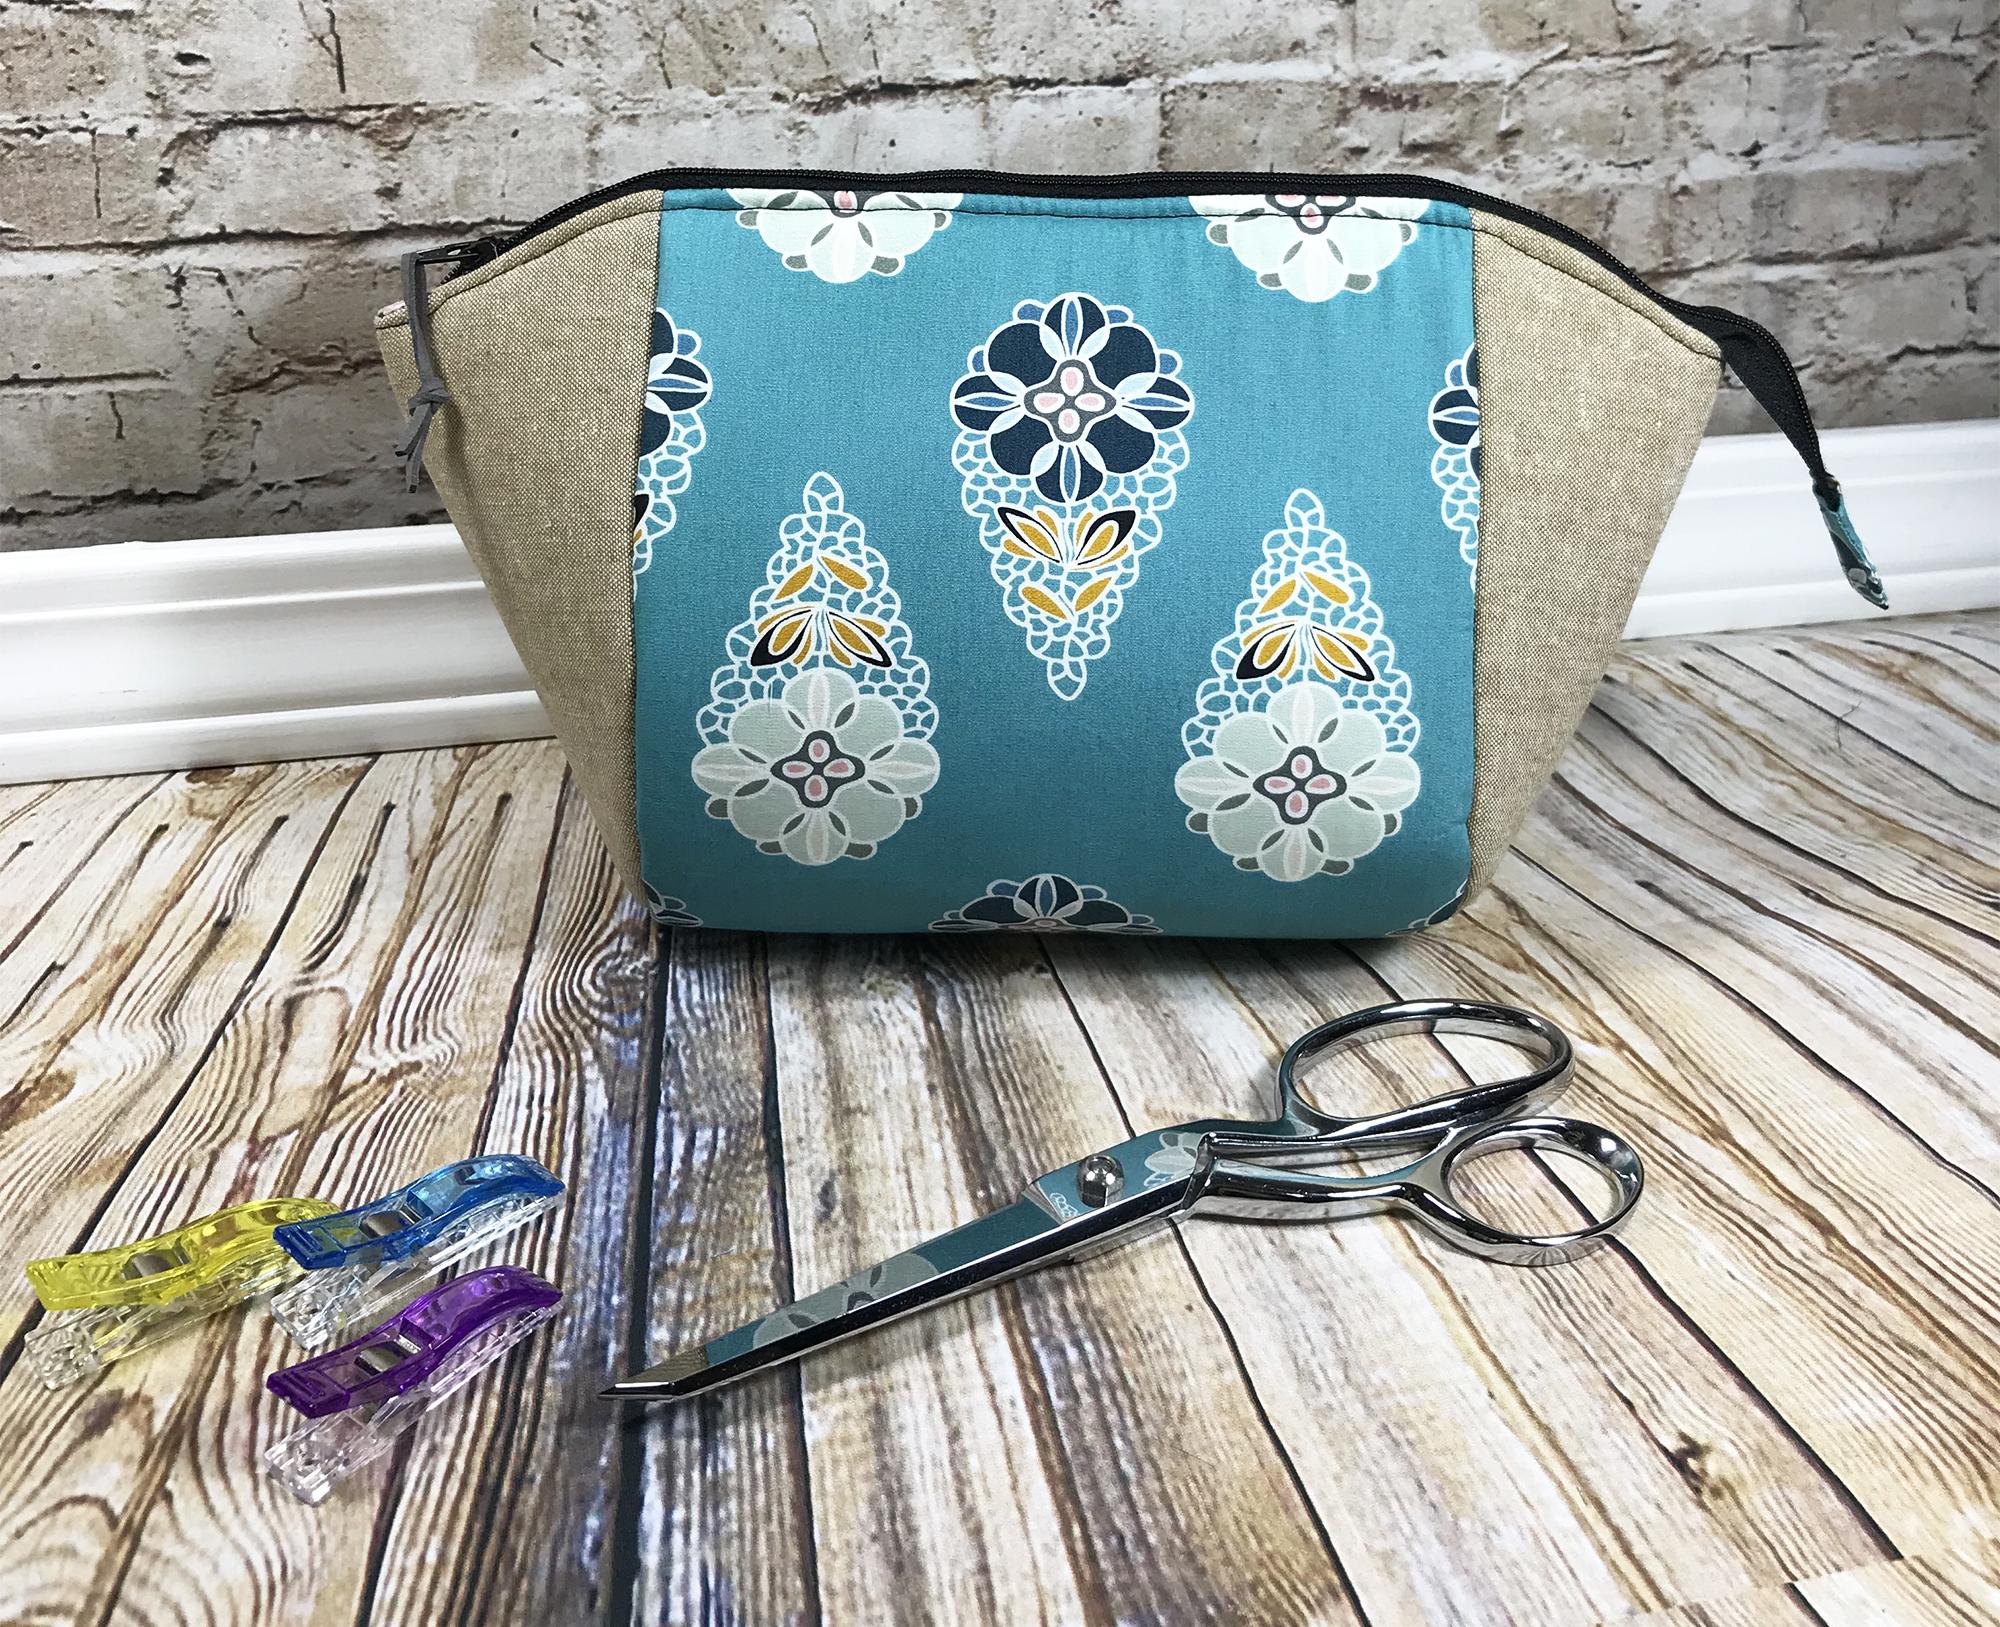 Sew Sweetness Minikins Cotton Candy Pouches sewing pattern, sewn by Angelina